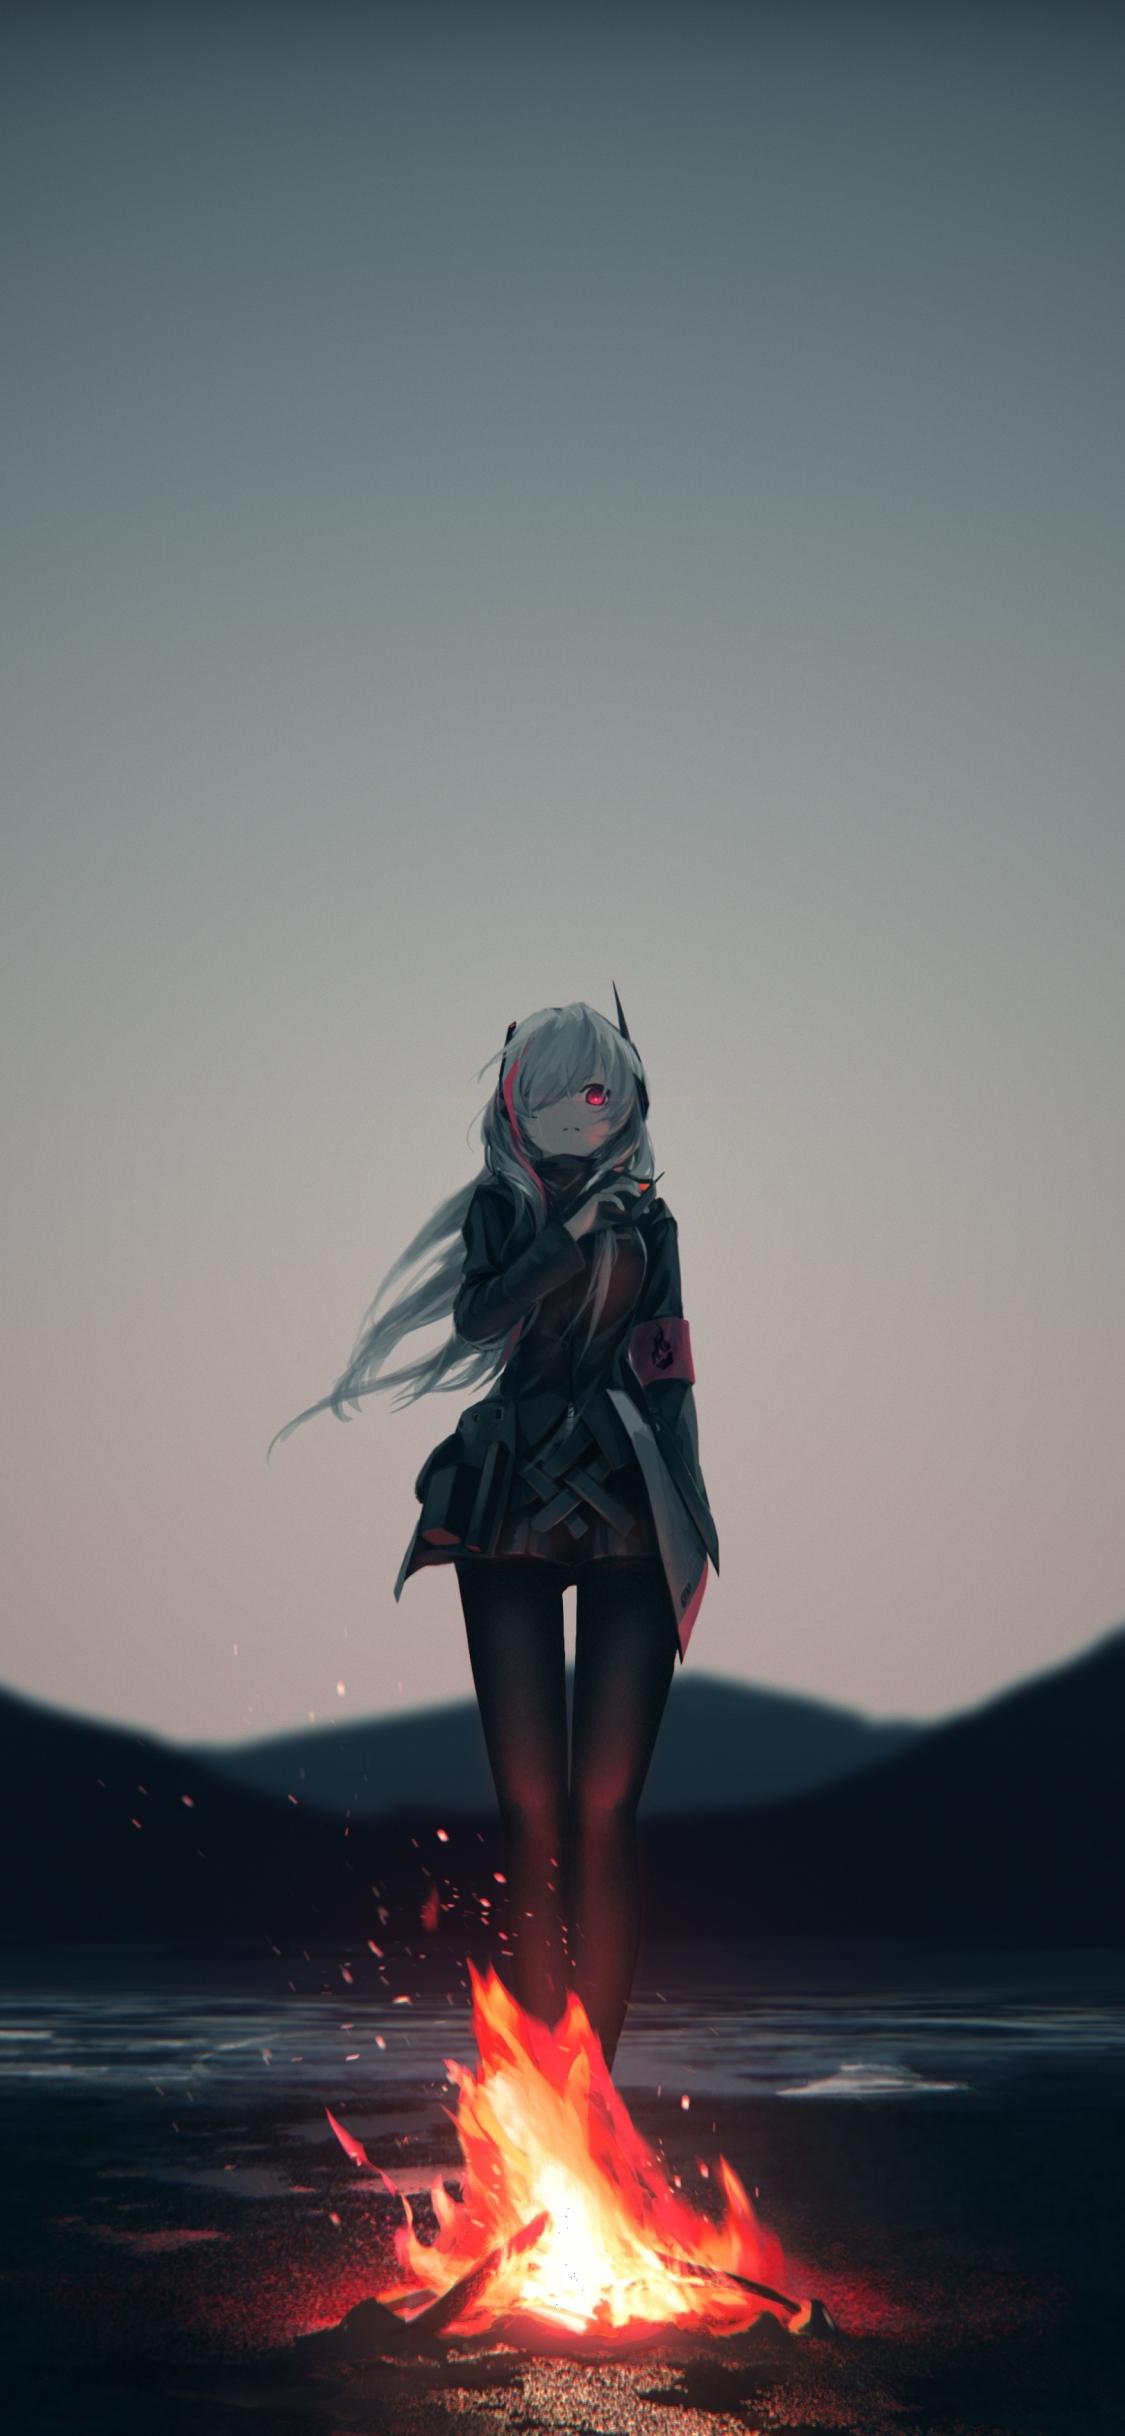 Download 1125x2436 Wallpaper Anime Girl Campfire Outdoor Original